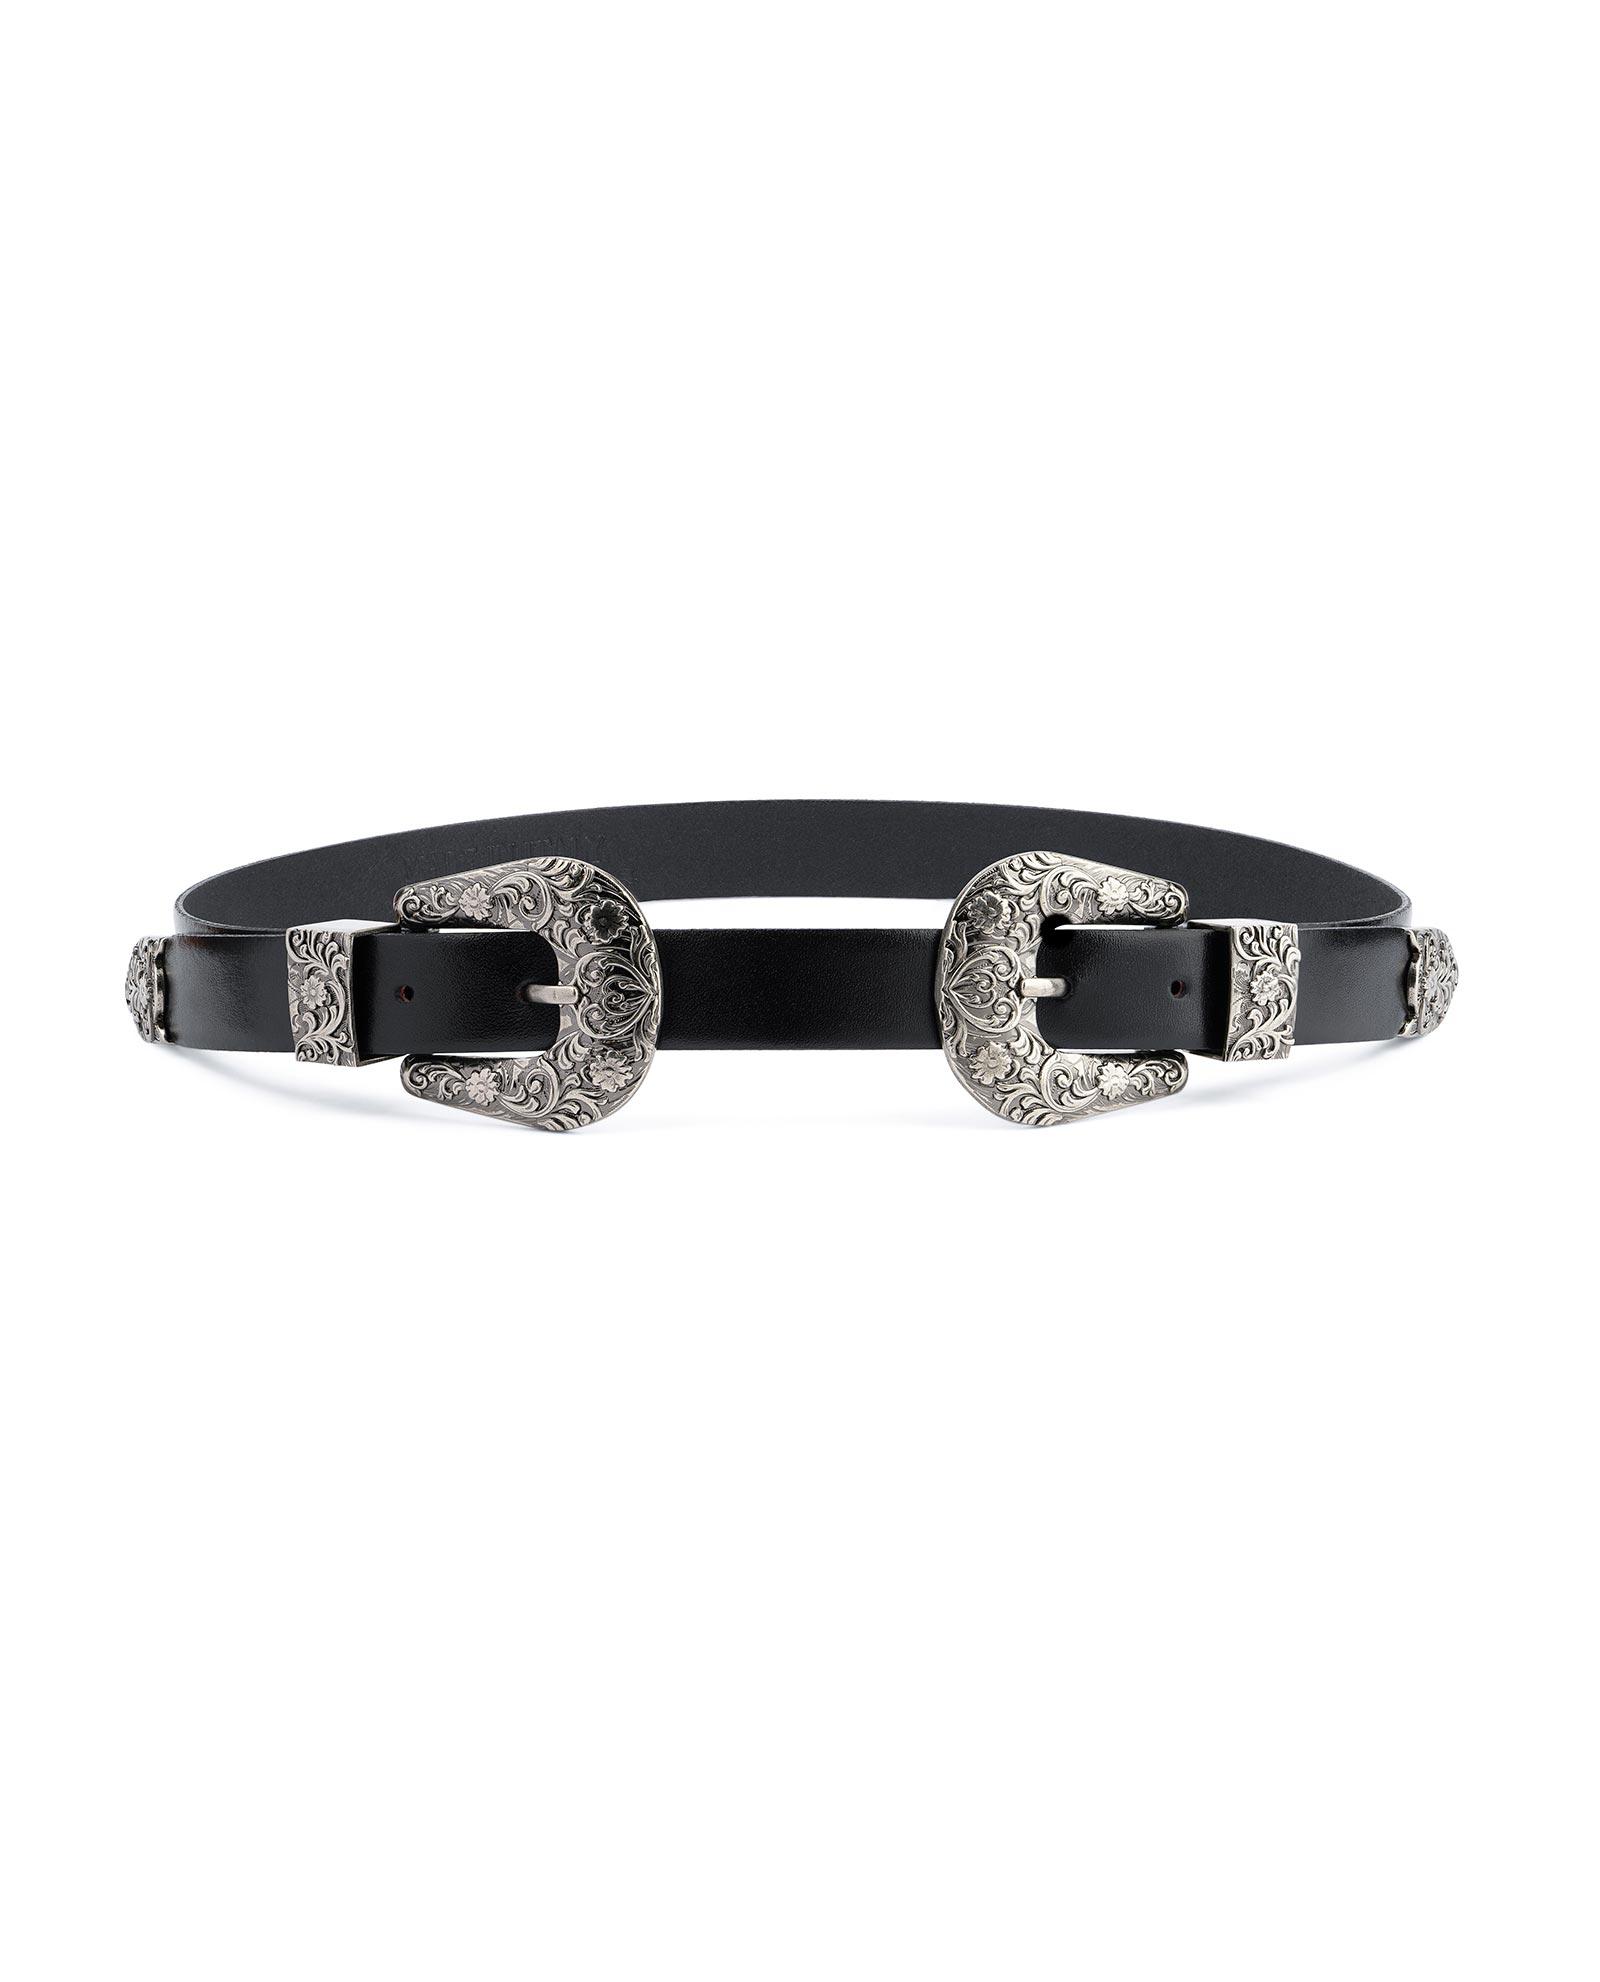 Western Double buckle belt Womens belts for dresses Black leather Lady For  jeans | eBay